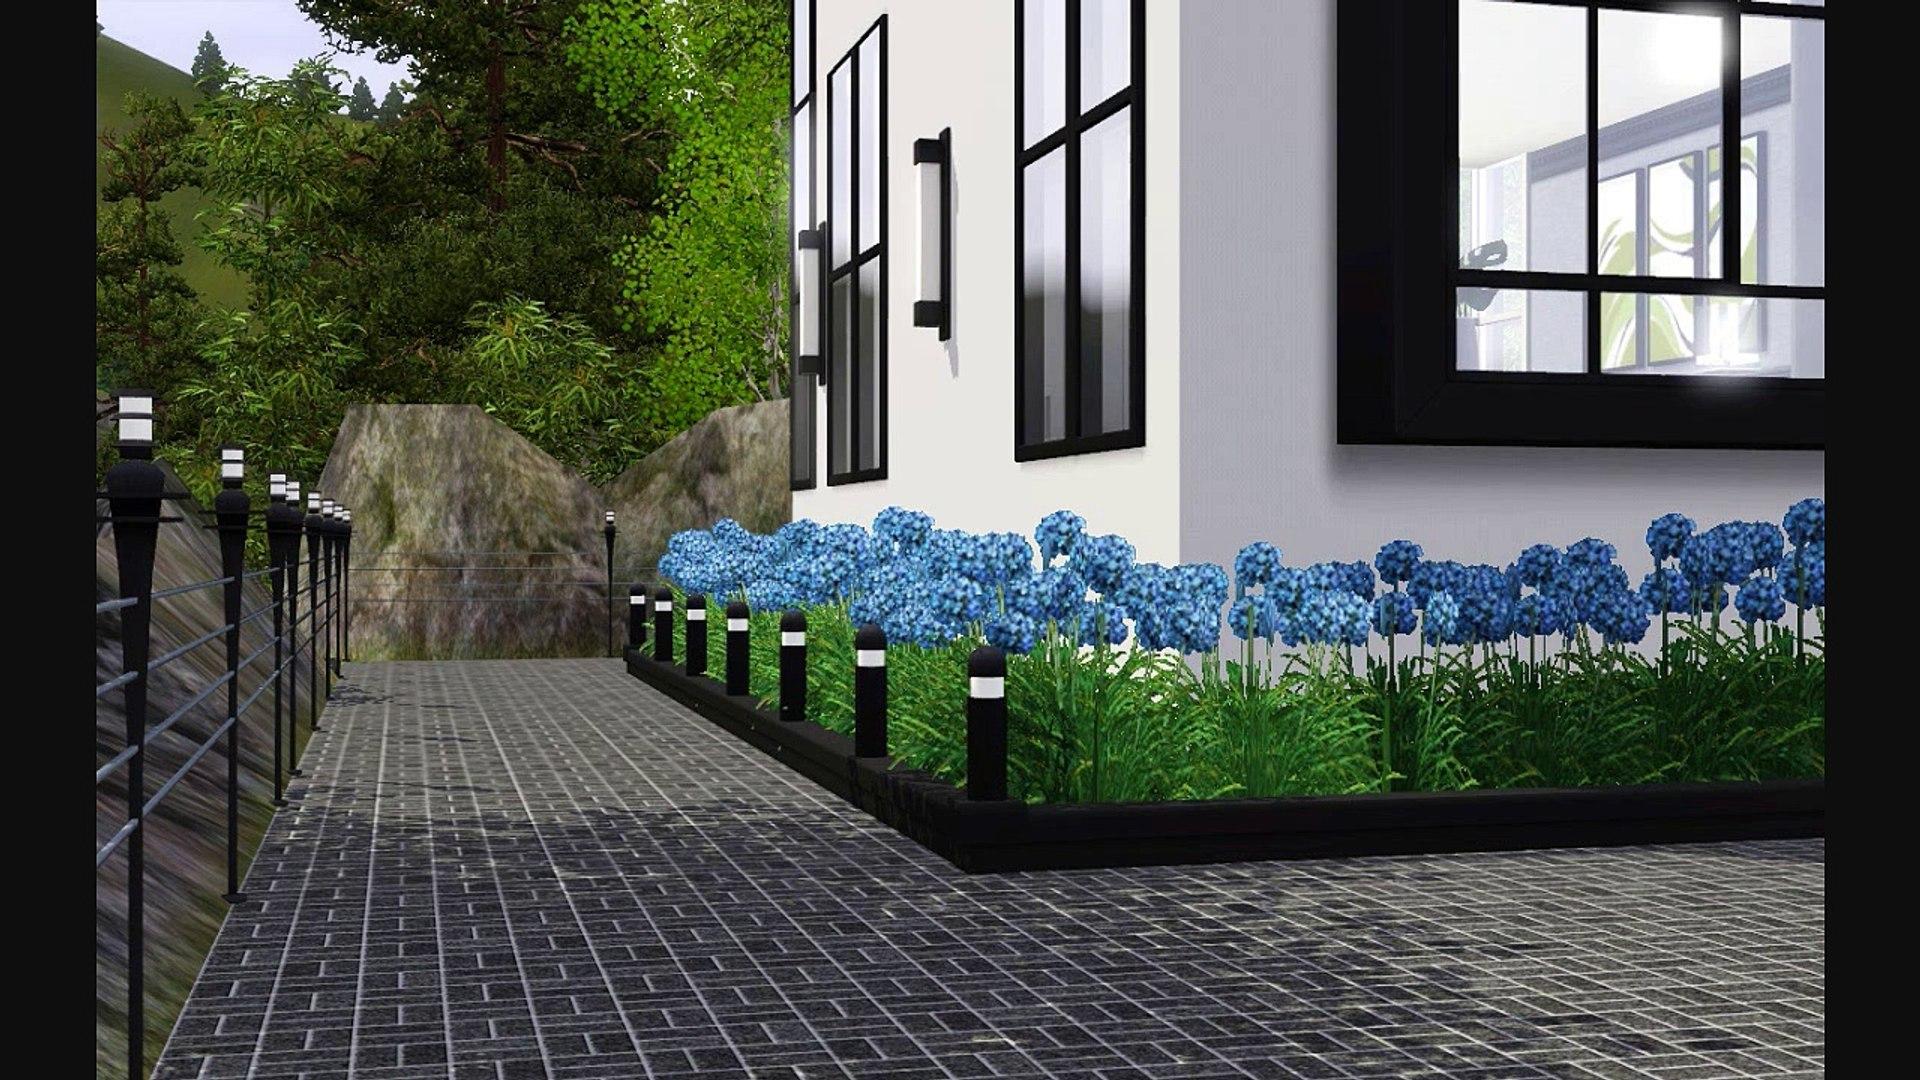 Bstones94 - The Ultra Modern Art-Deco Mountain Home - Sims 3 House Design